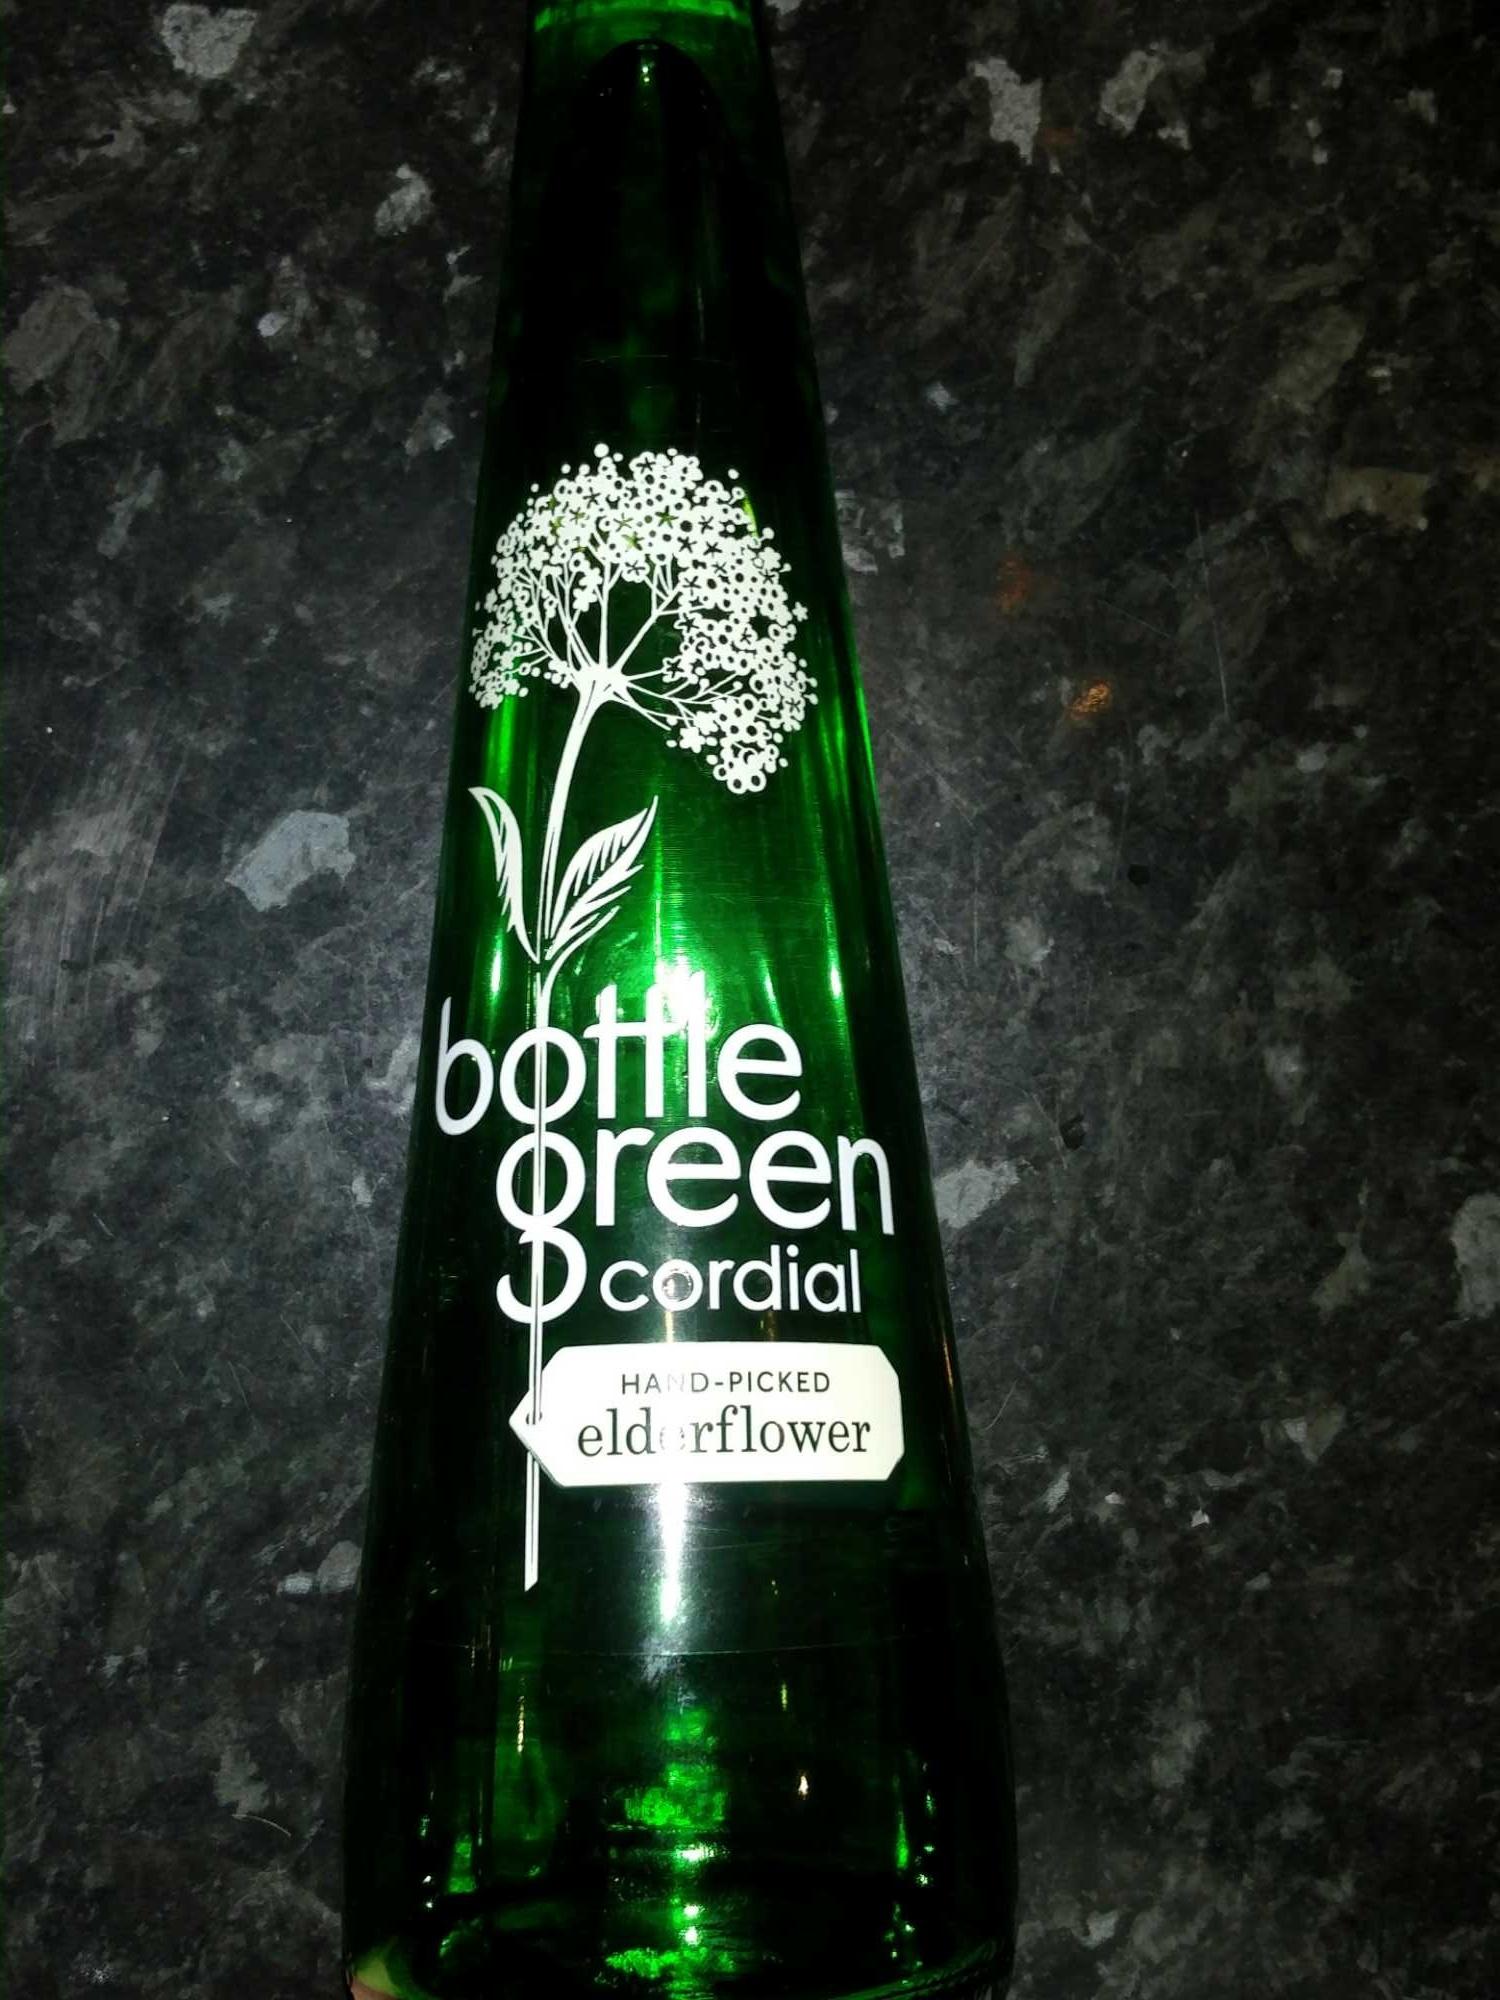 Bottle of Green Cordial (Handpicked Elderflower) - Product